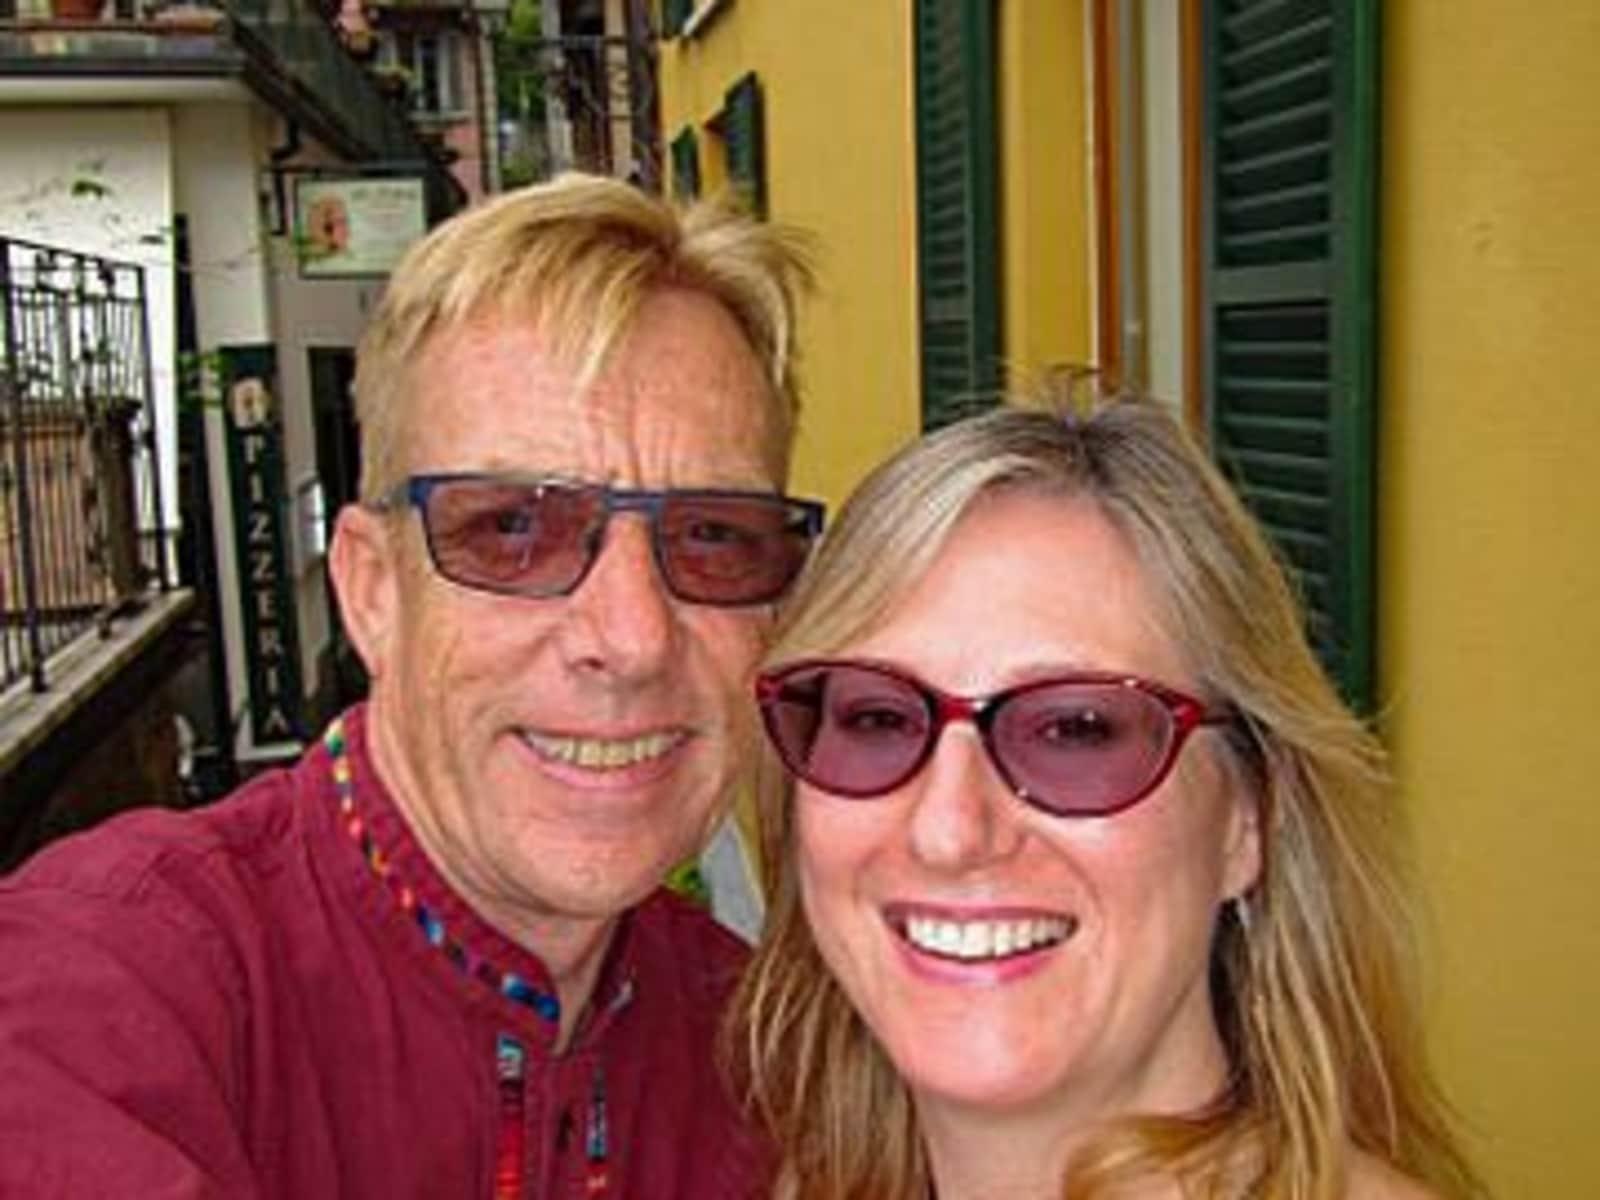 Sheron & Thomas from Brampton, Ontario, Canada